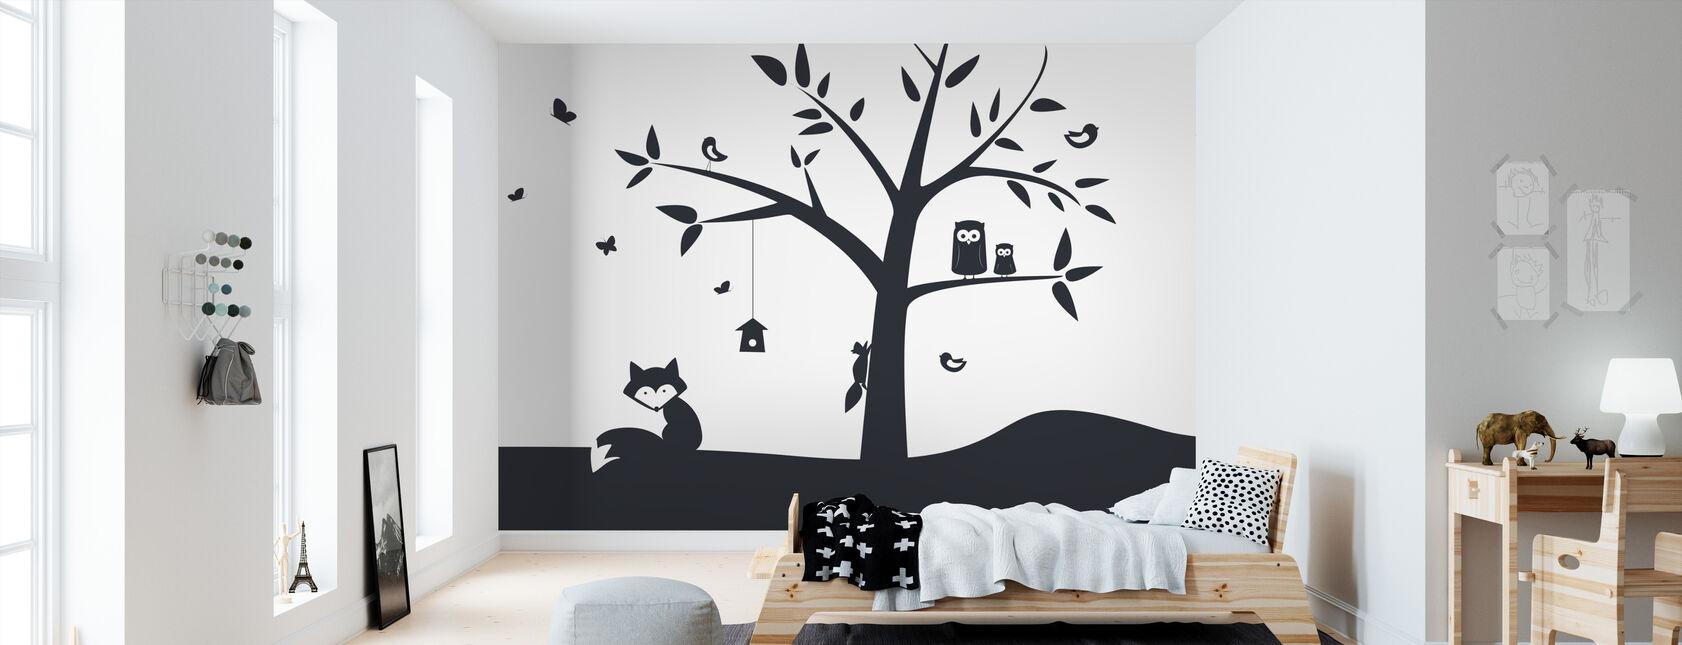 Animal Tree- Black - Wallpaper - Kids Room